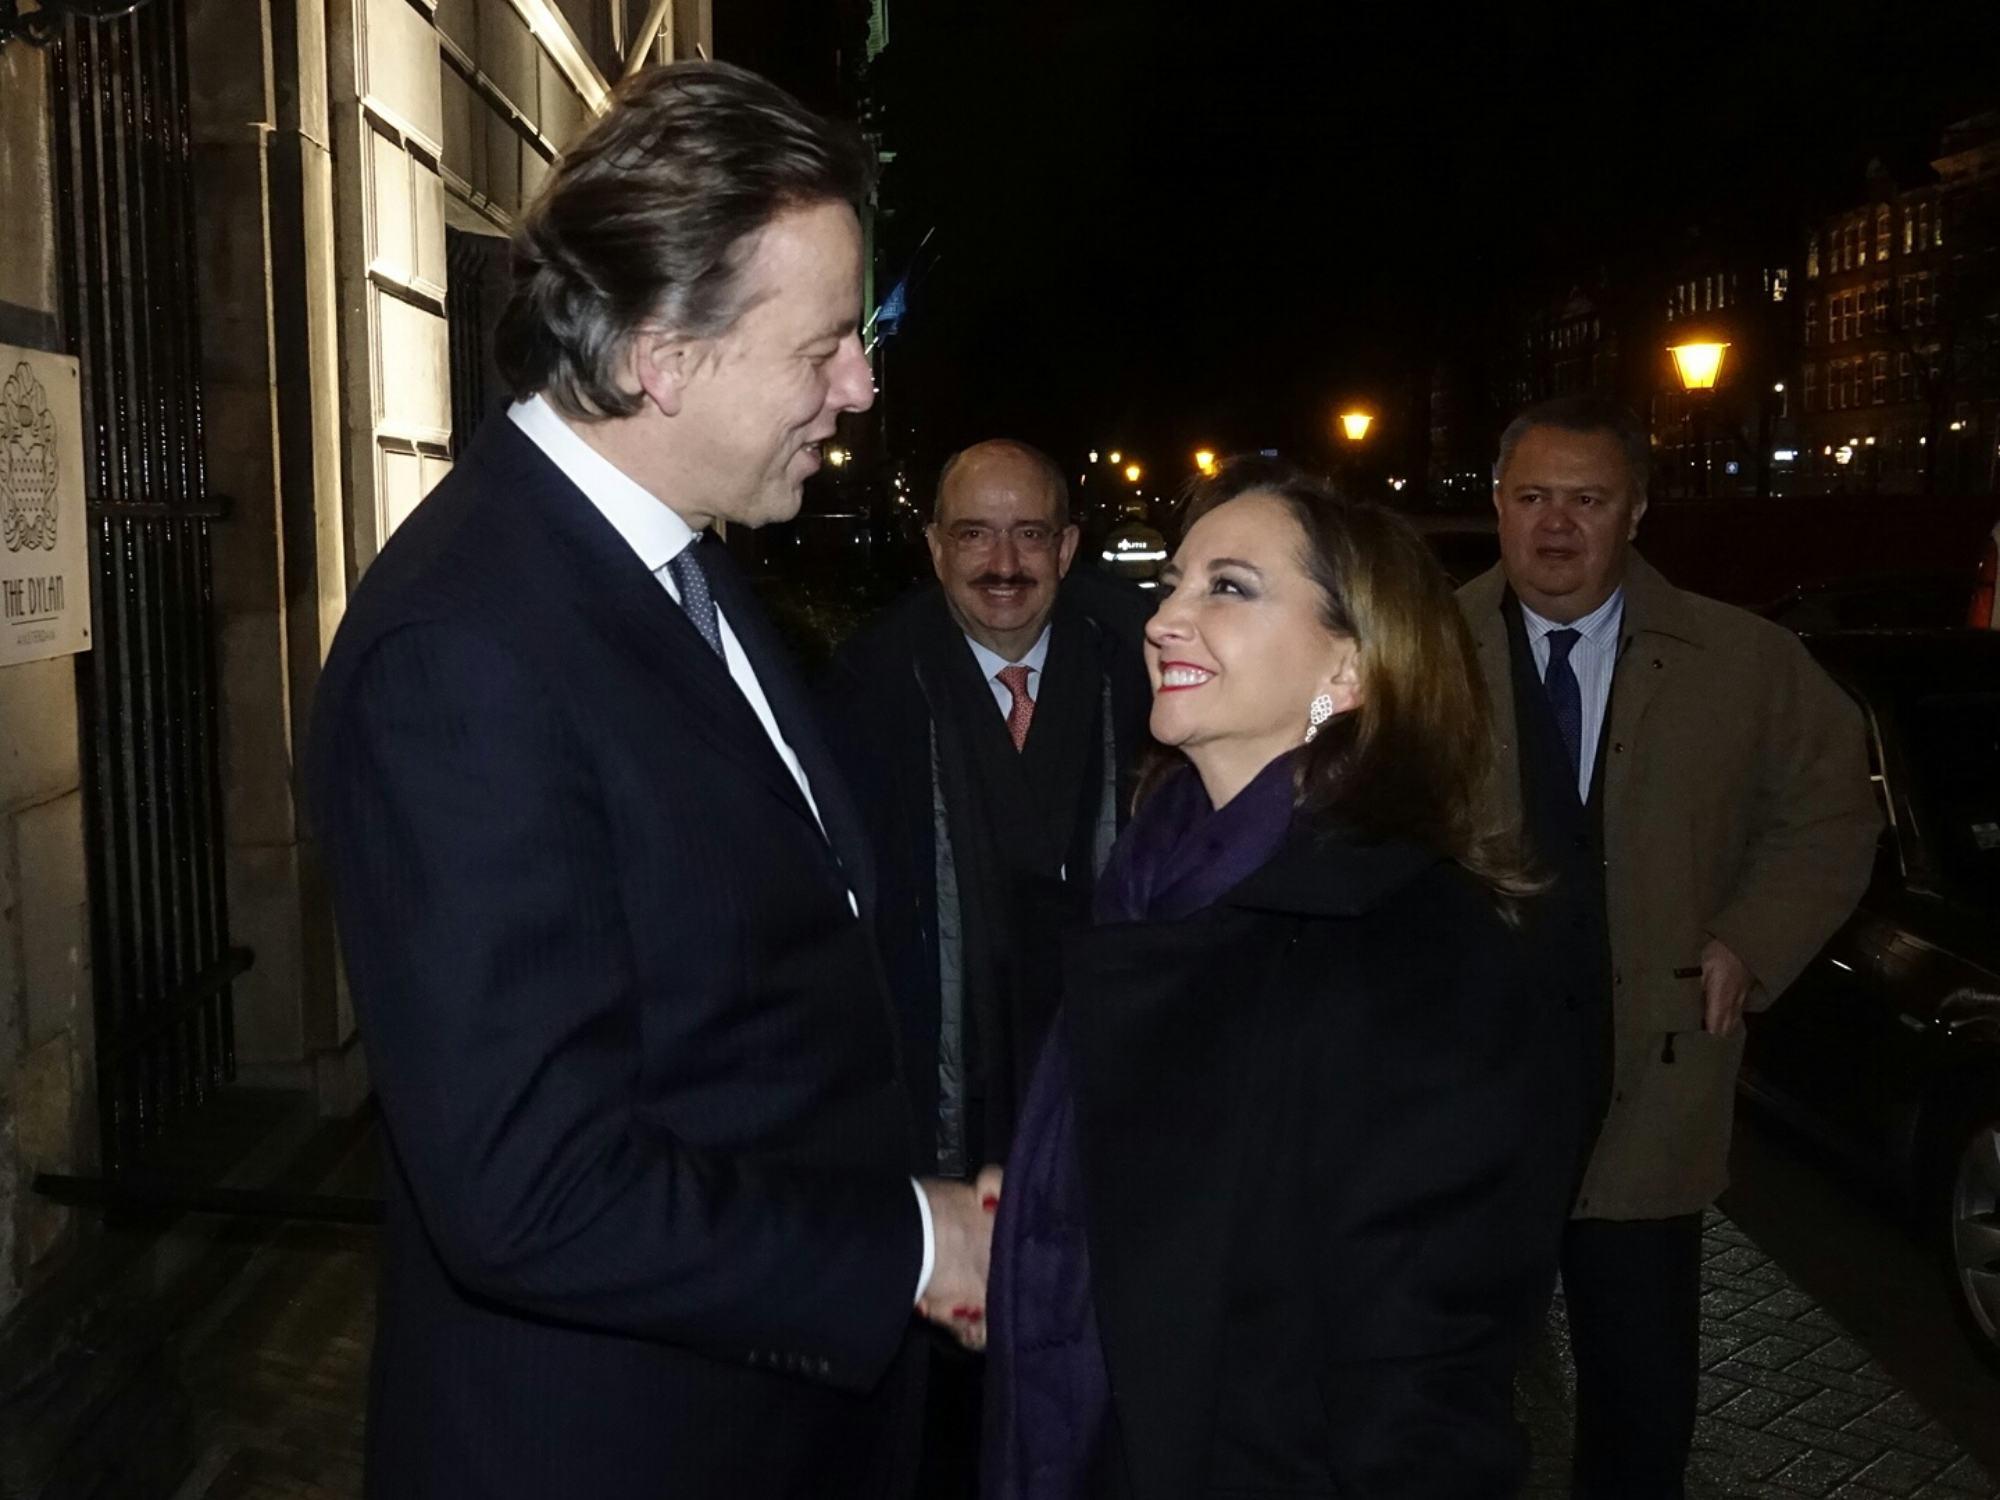 FOTO 1 Canciller  Claudia Ruiz Massieu con el Ministro de Exteriores de Pa ses Bajos  Bert Koendersjpg